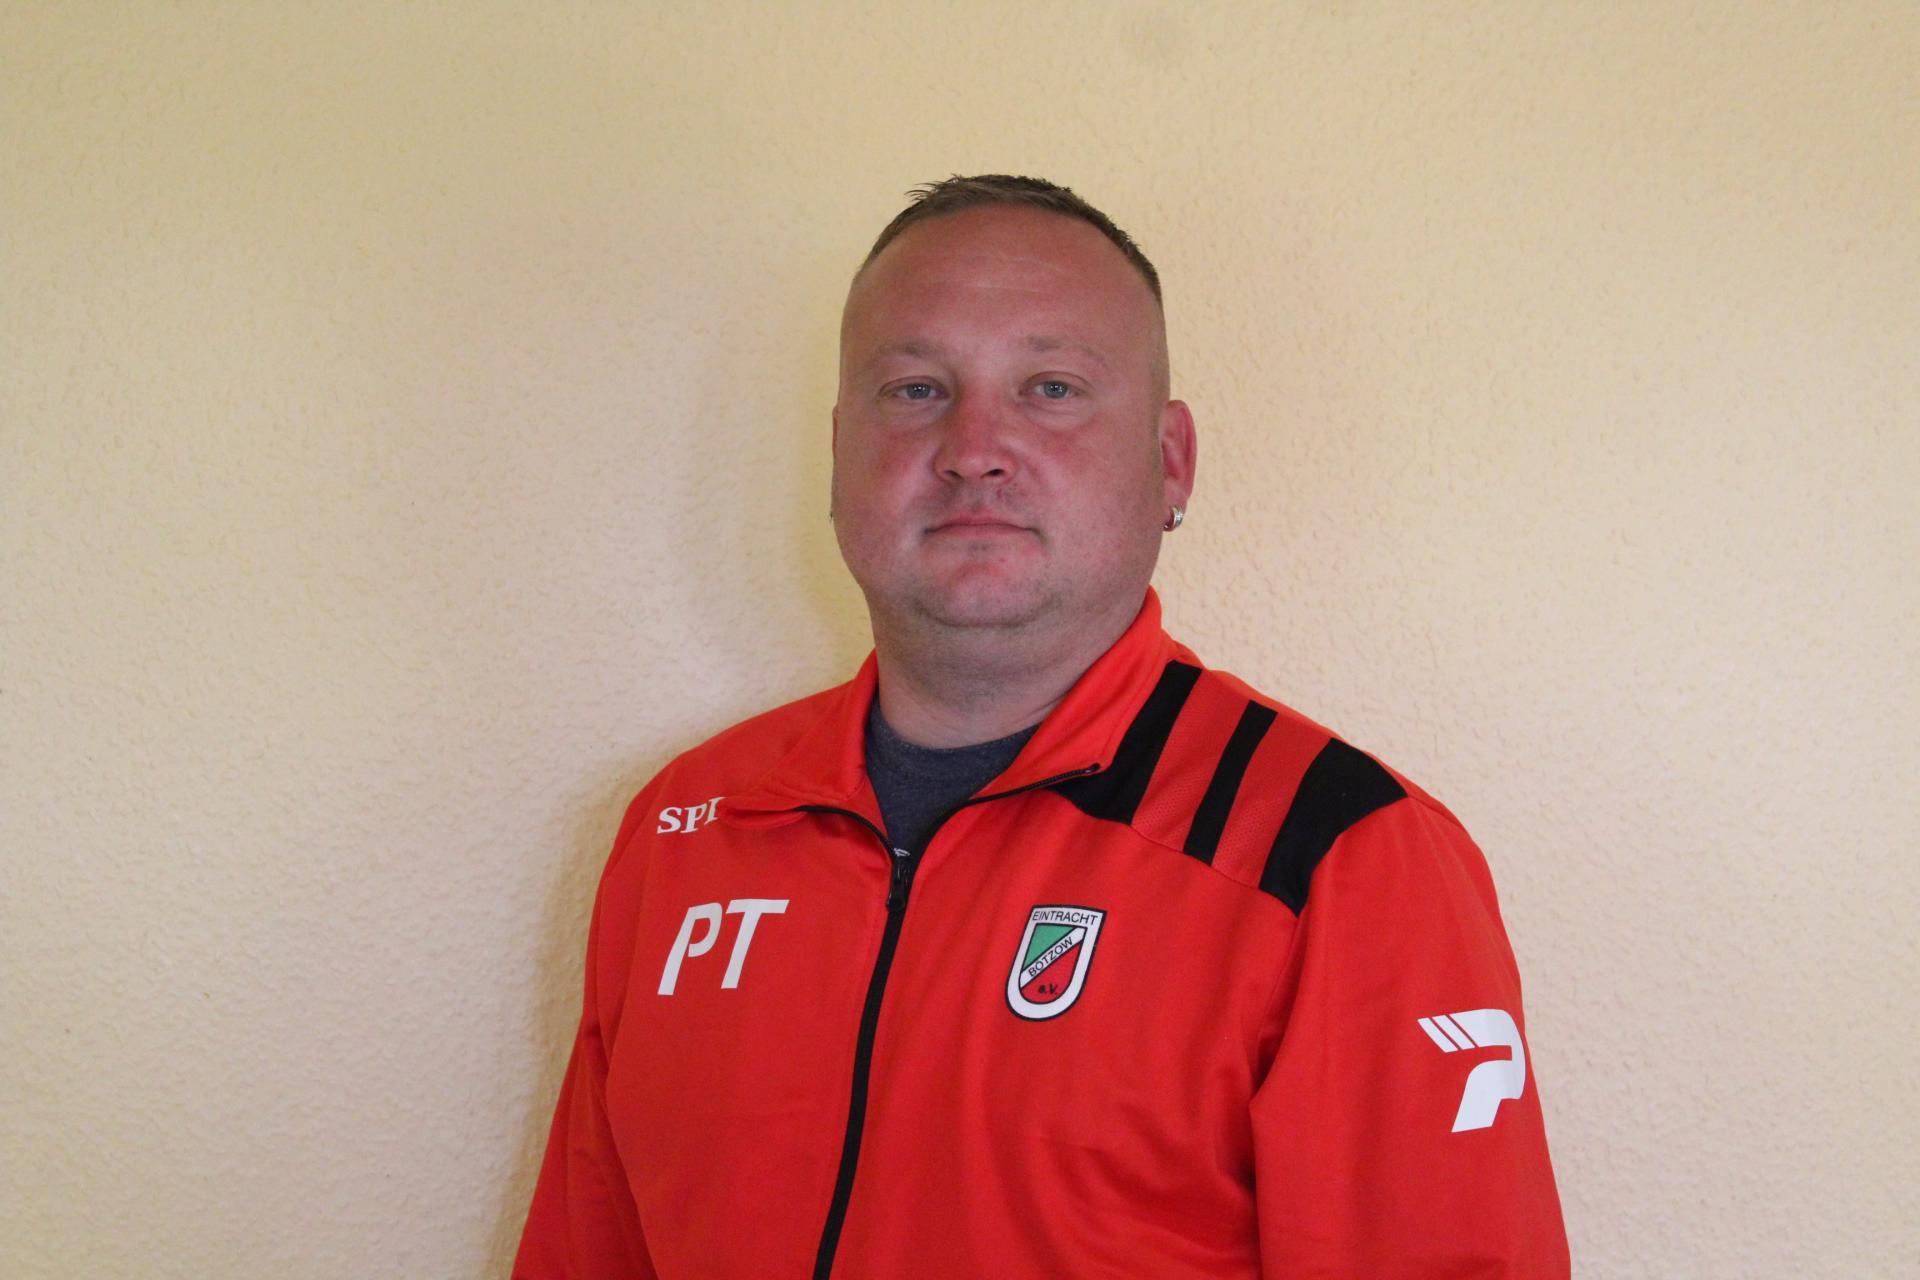 Patrick Timmer